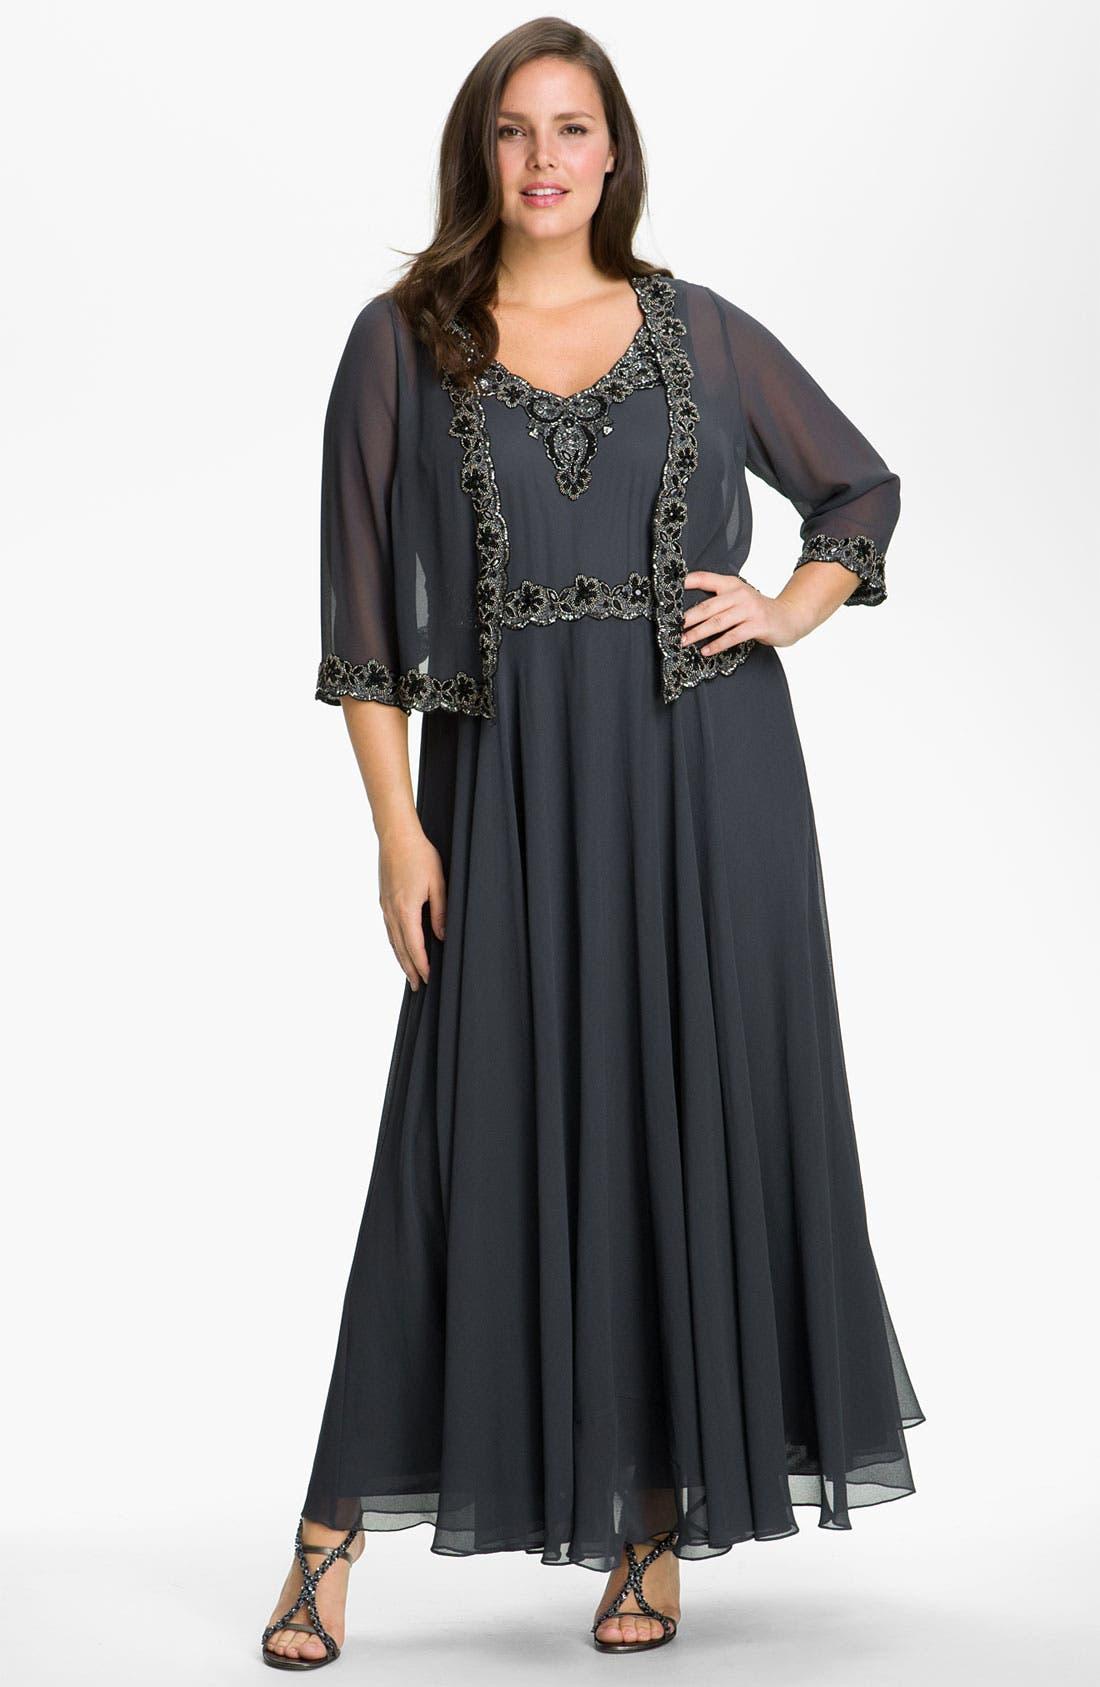 Main Image - J Kara Beaded Chiffon Gown & Jacket (Plus Size)